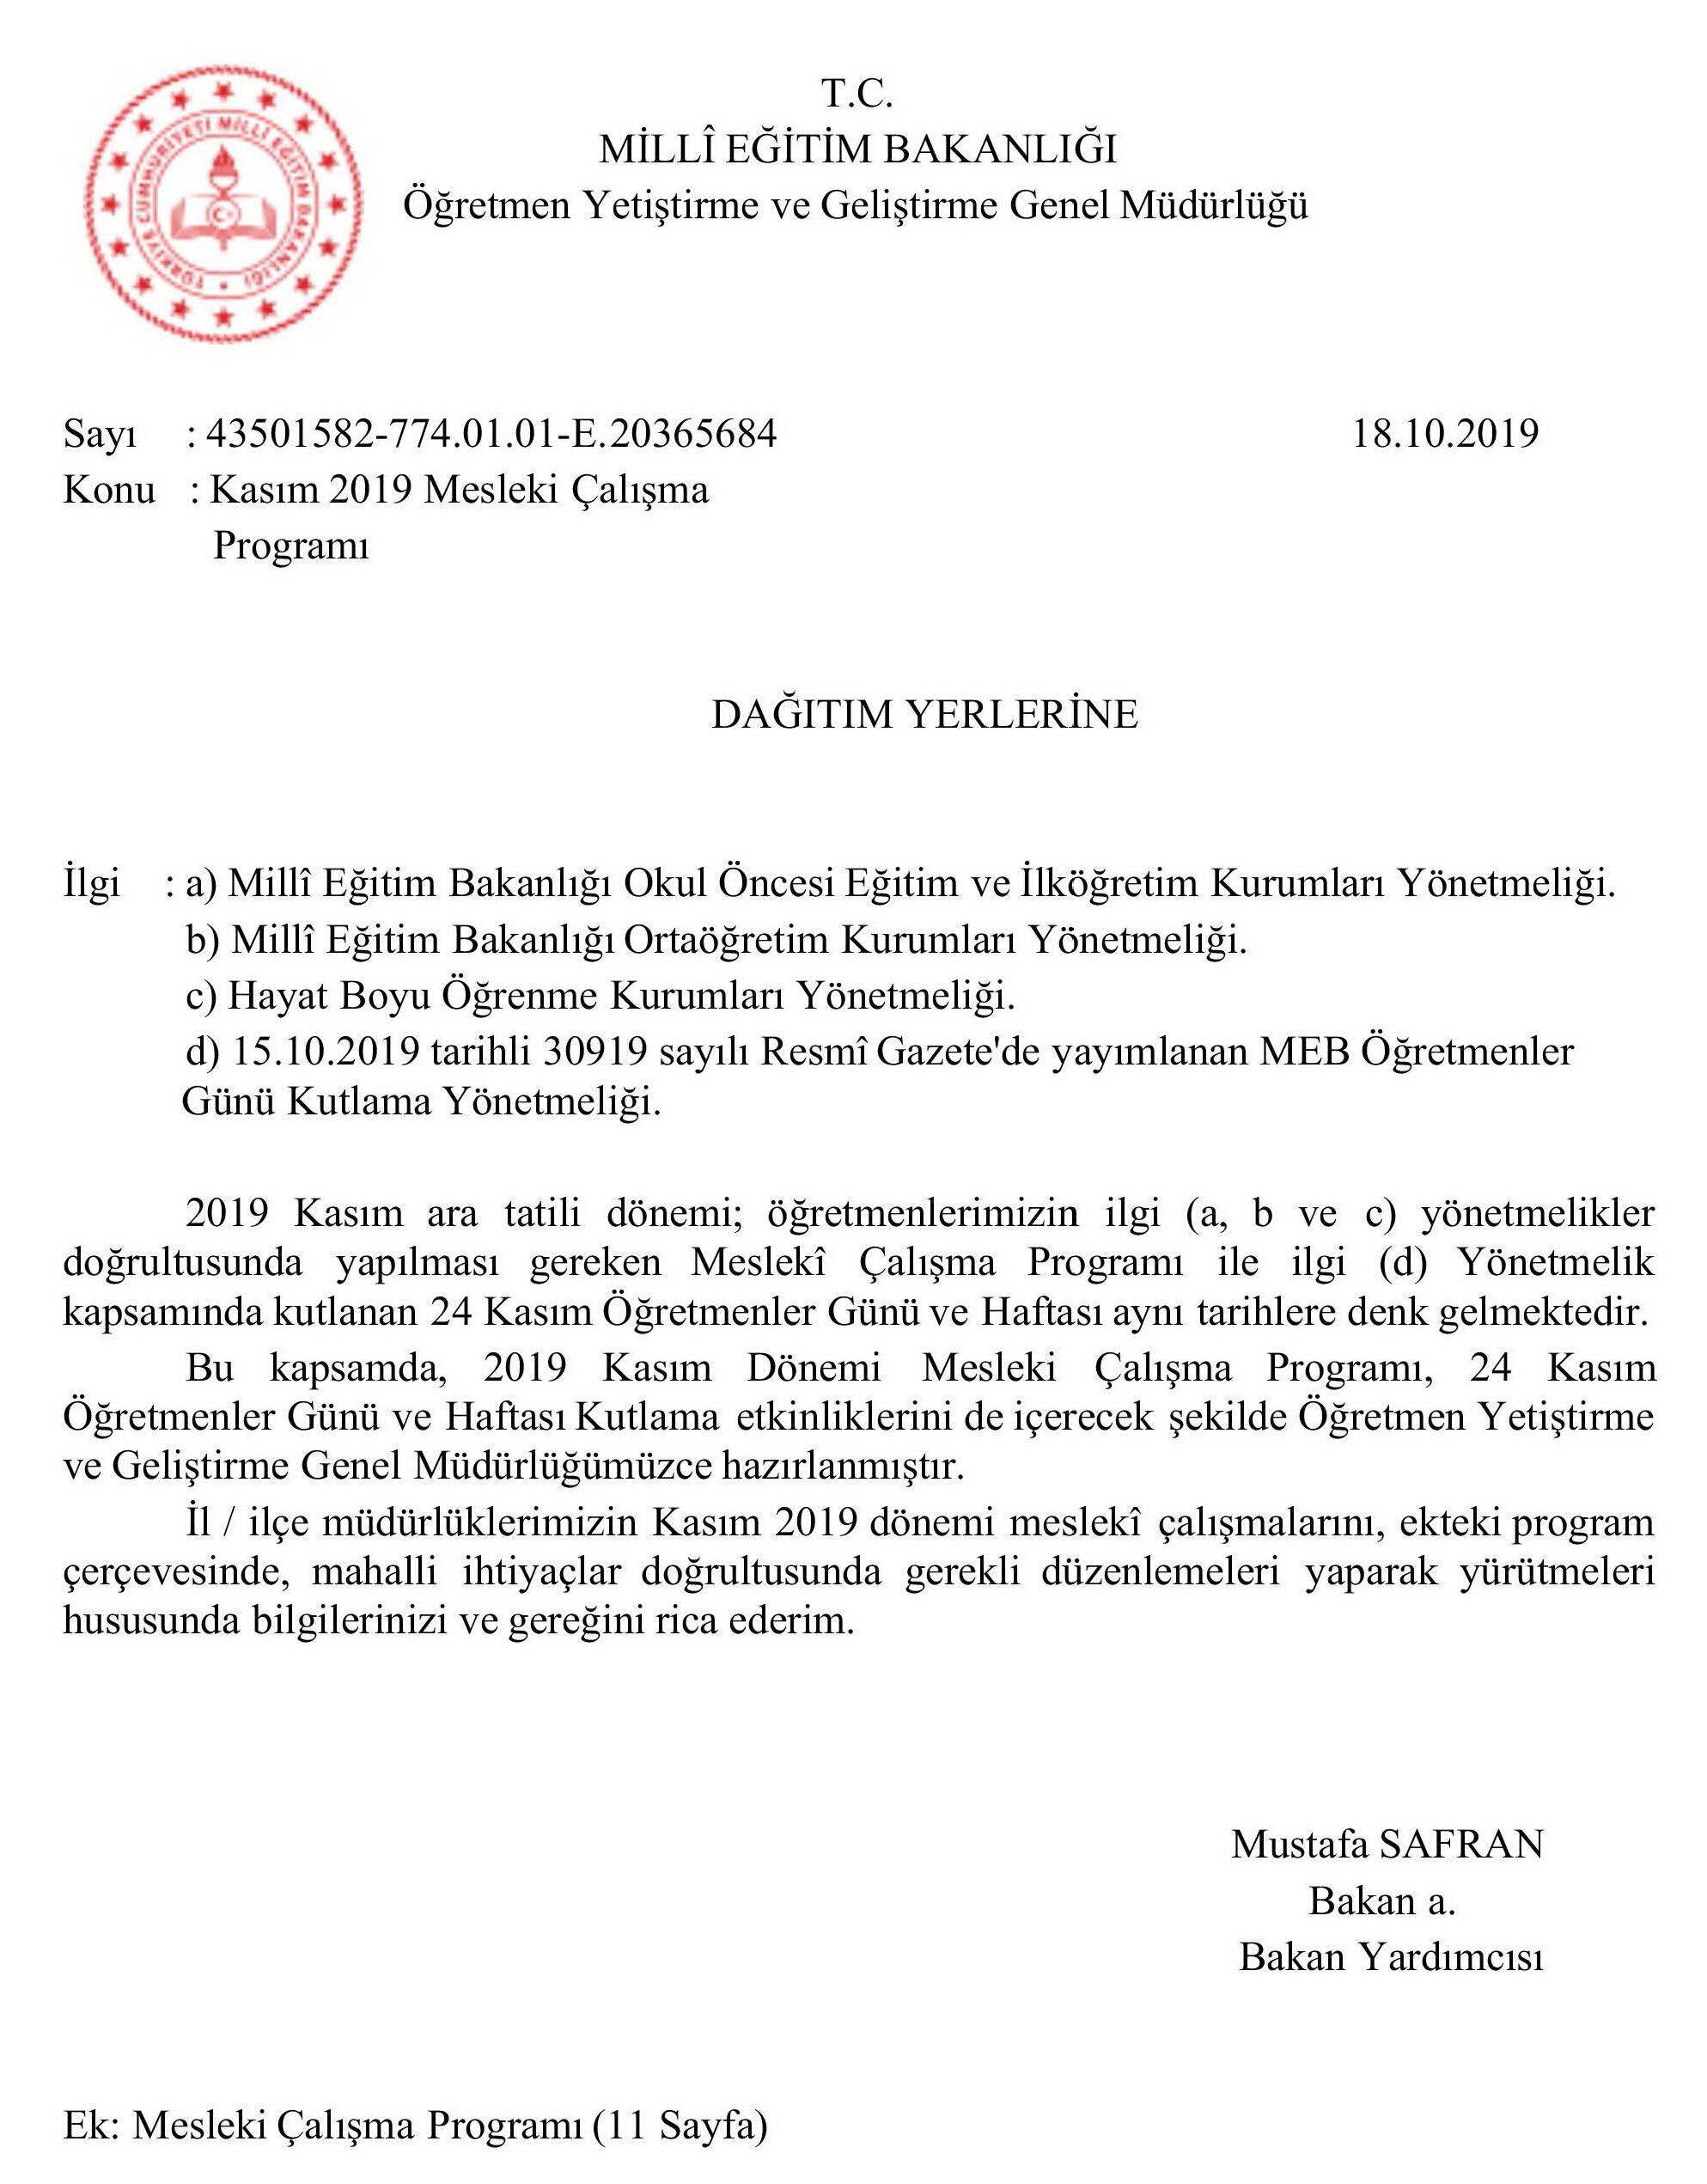 Ogretmenlerin 2019 Yili Kasim Ayi Mesleki Calisma Programi Belli